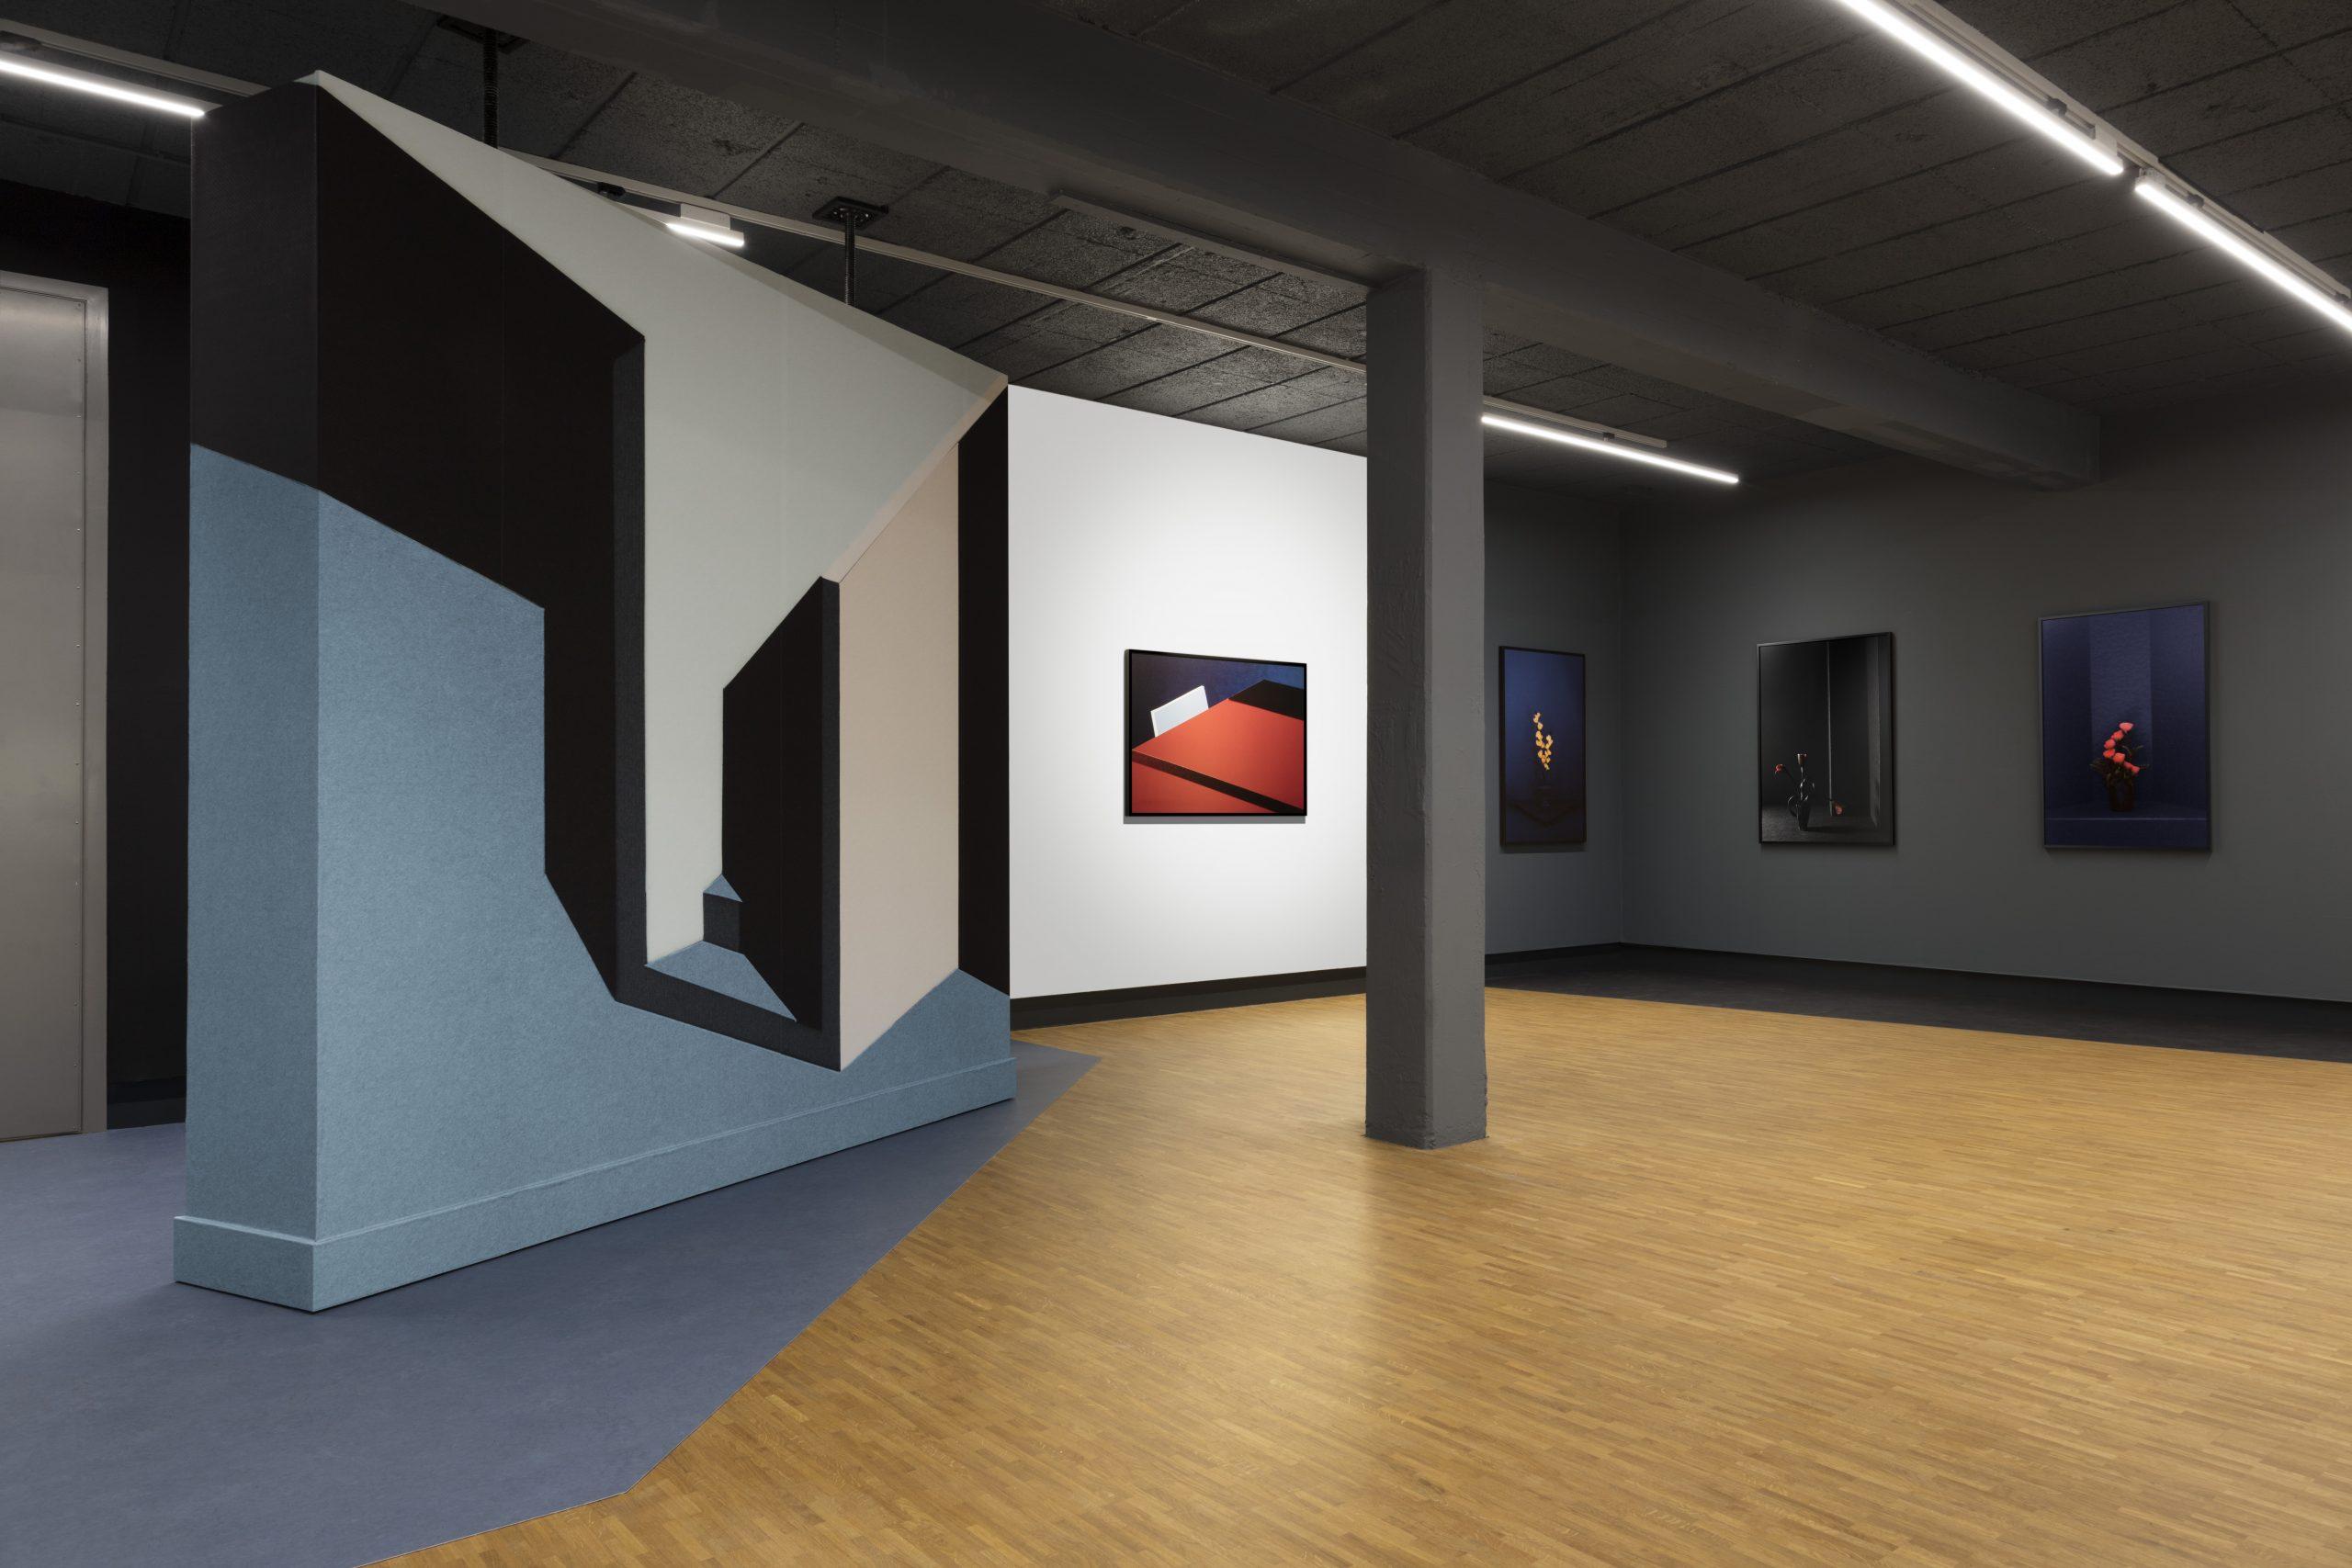 Papier en Licht, Fotomuseum Den Haag